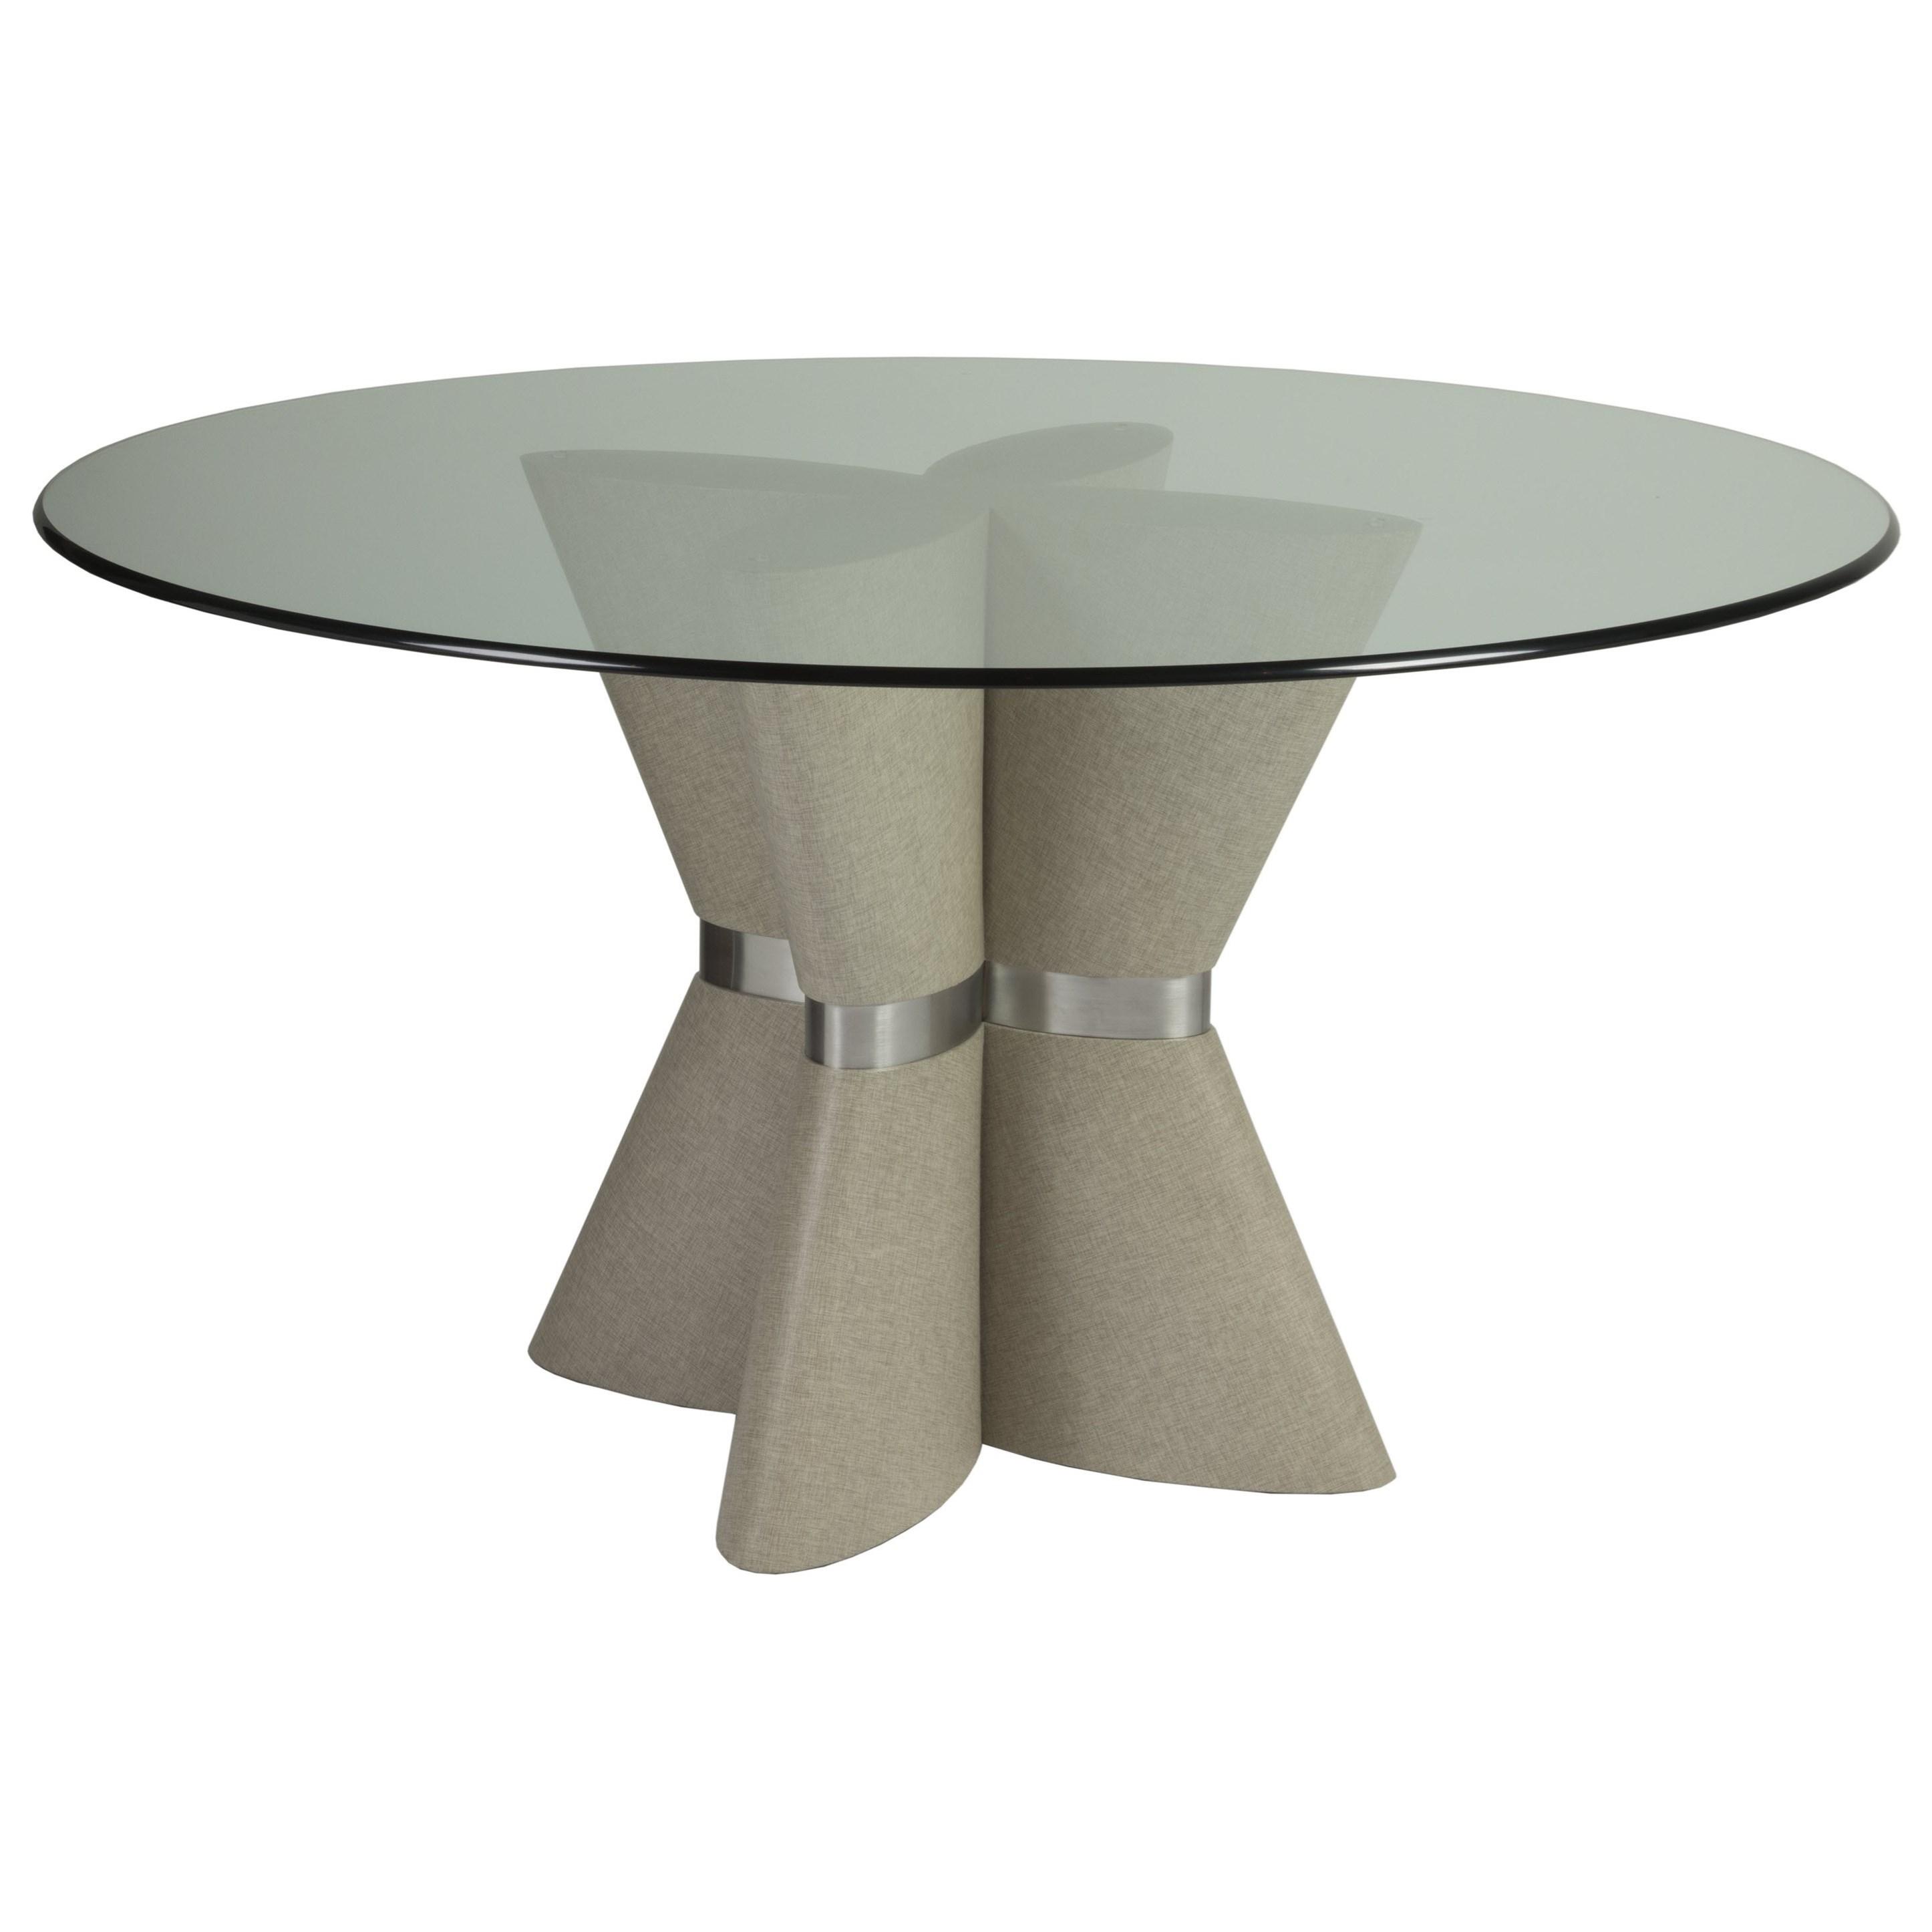 Zeitgeist Linen Dining Table by Artistica at Sprintz Furniture